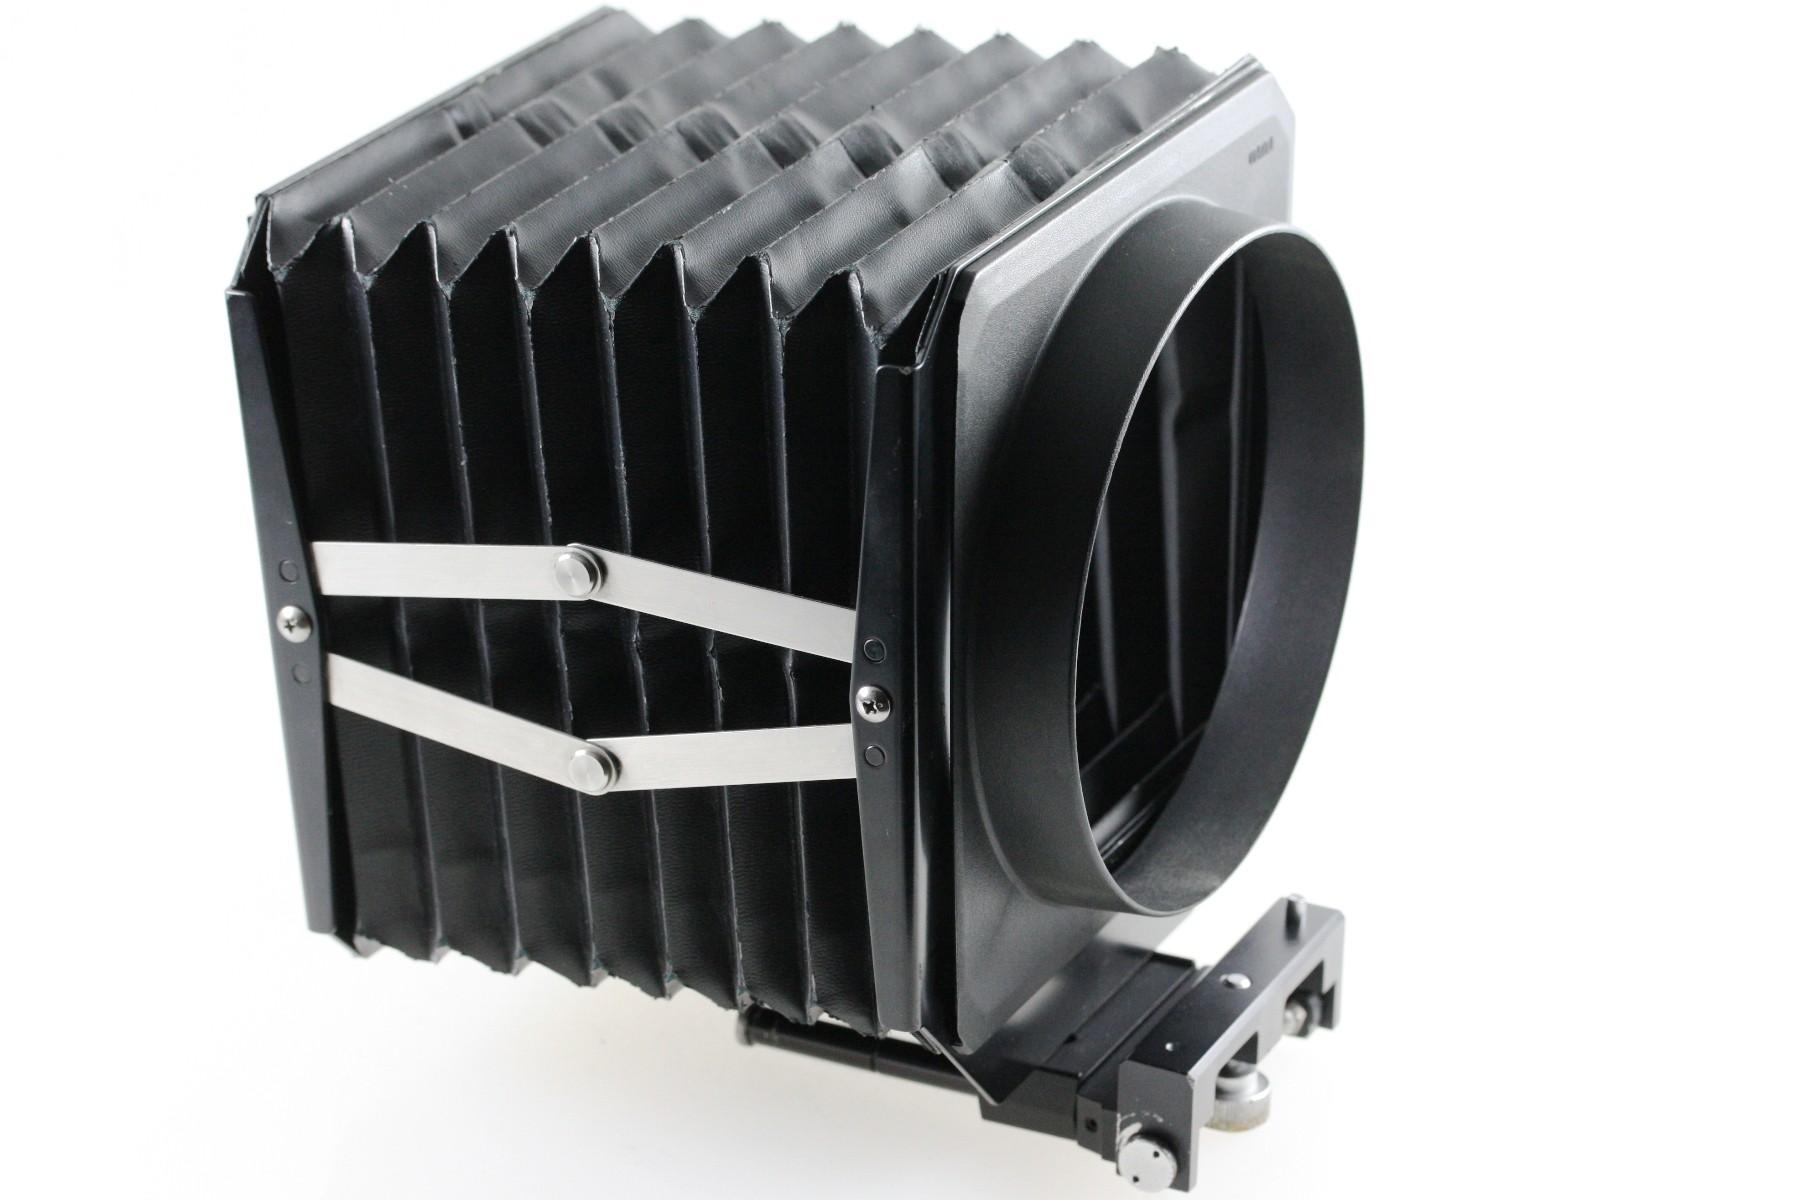 100  Blindnieten 5x16 Alu//Stahl Flachkopf 5,0 x 16  Standard NM